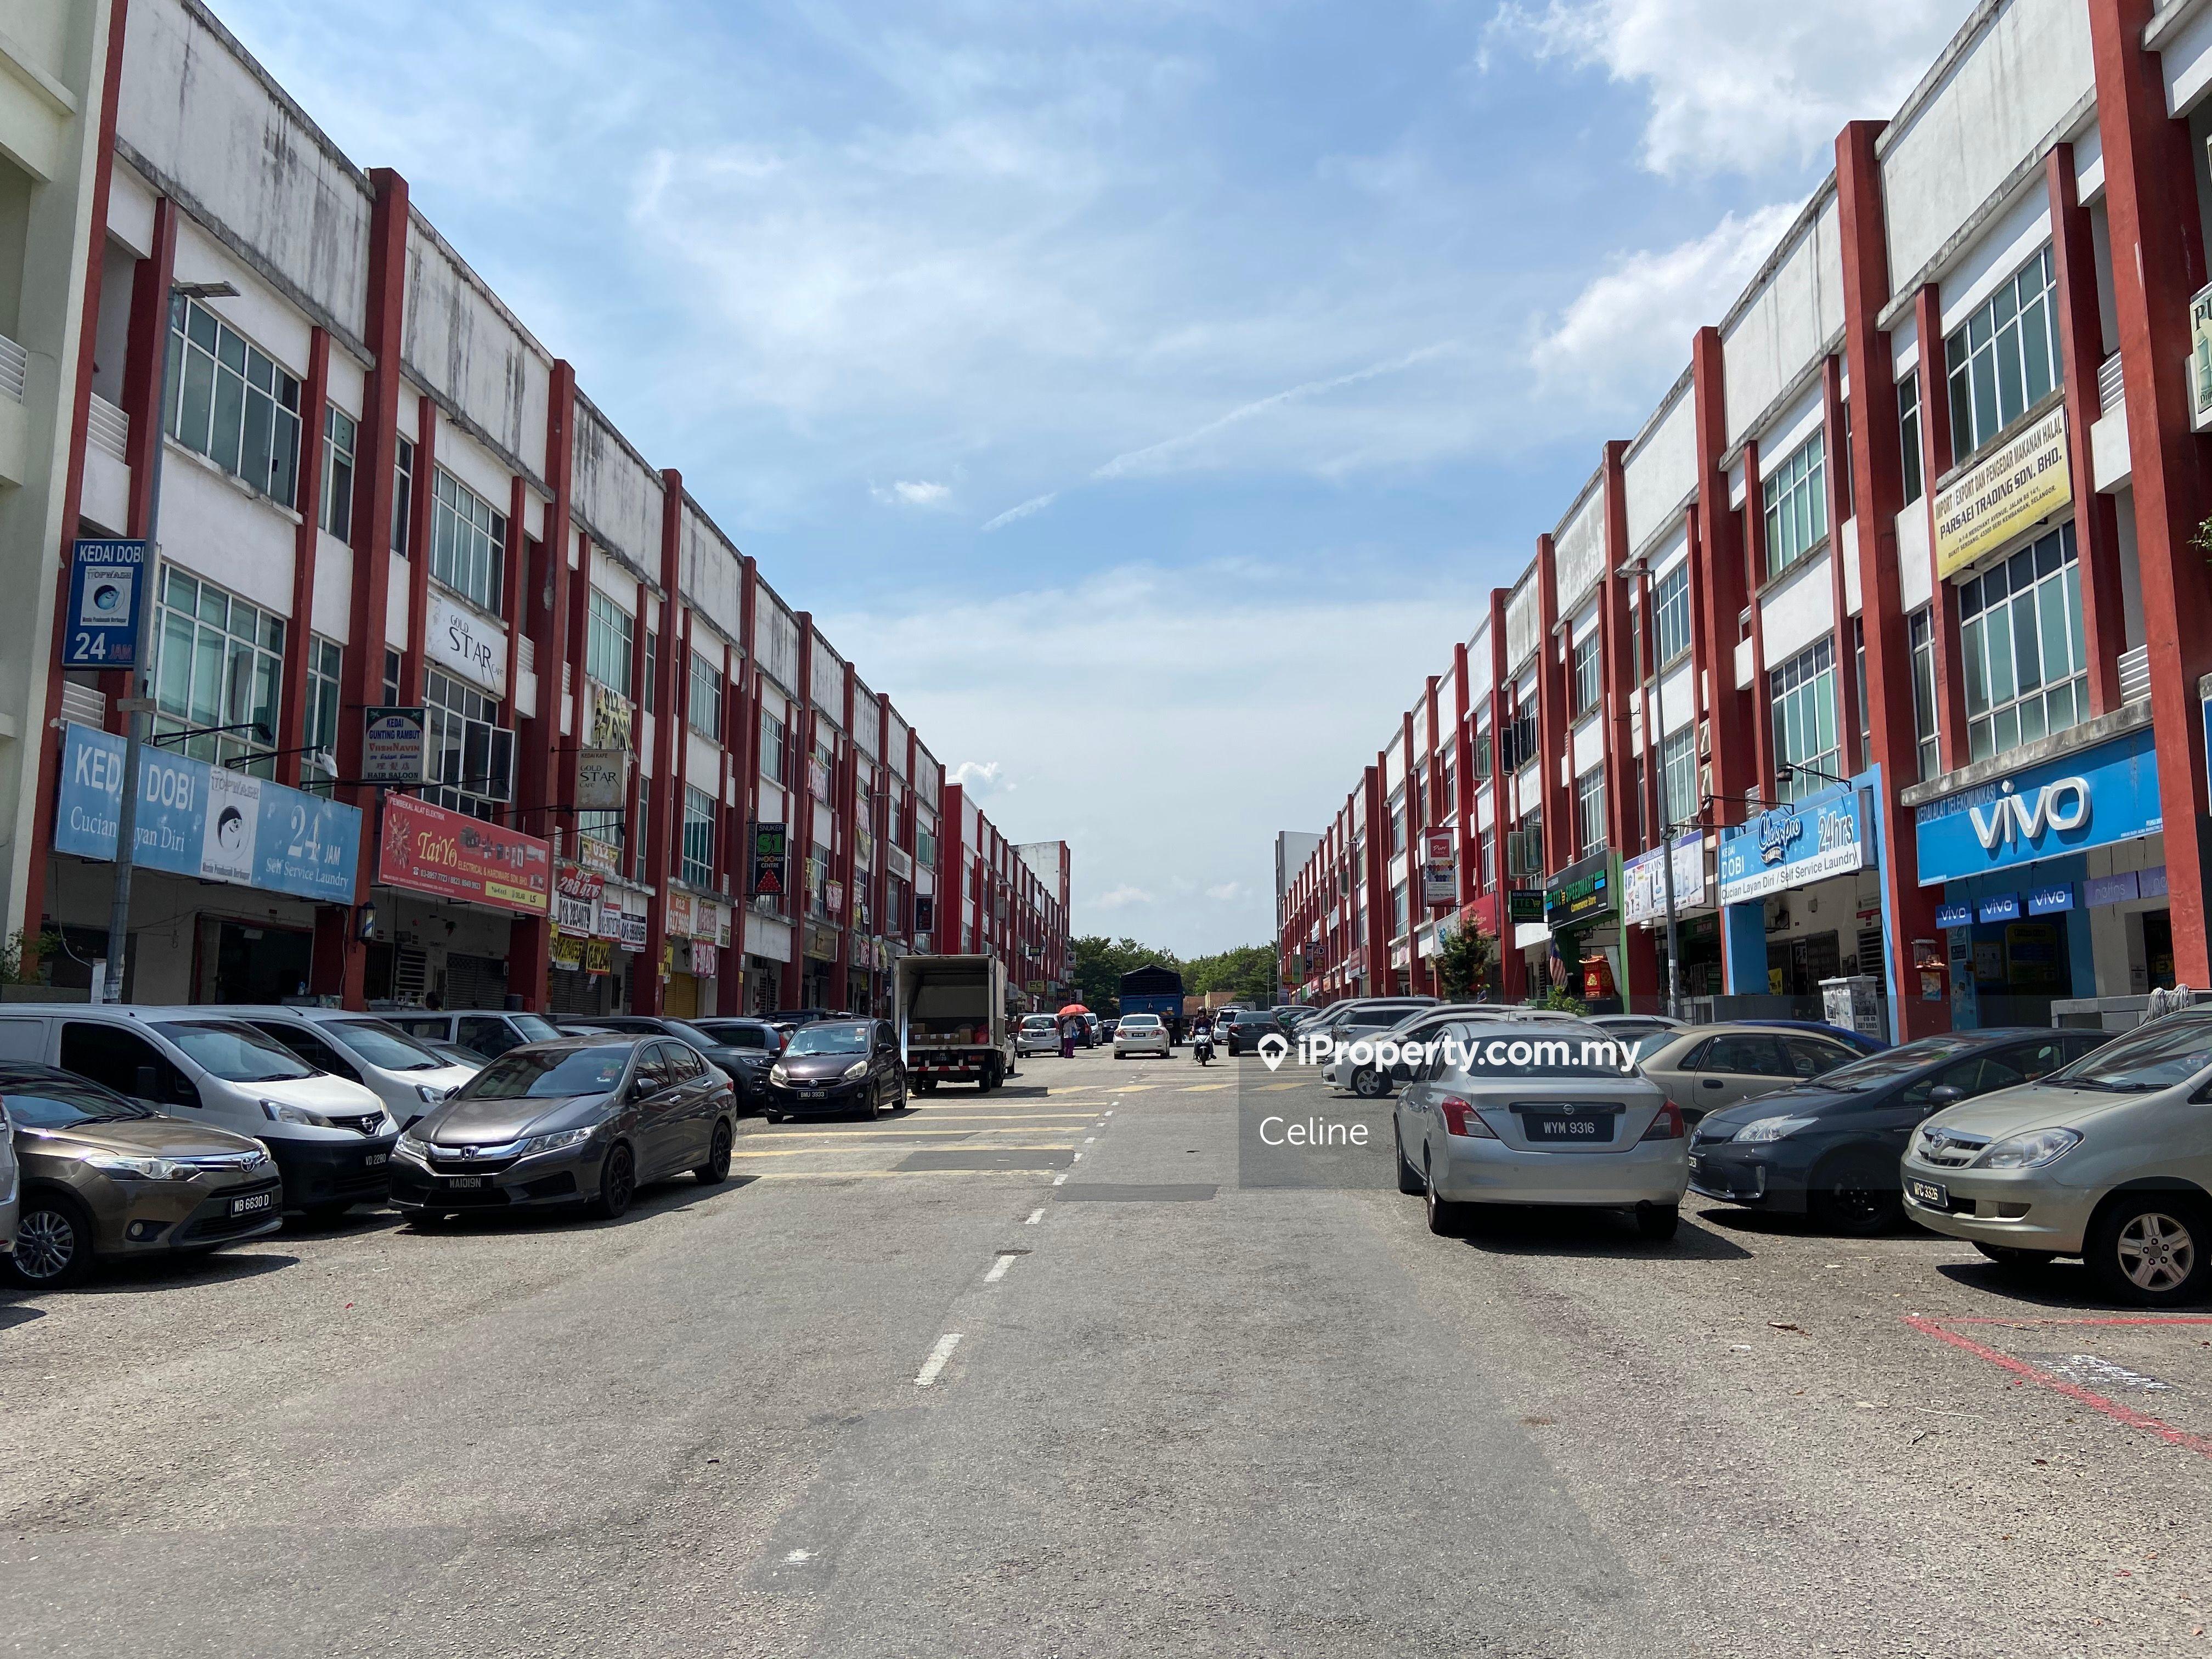 Merchant Avenue, 32 Avenue, Bs 9, Bukit Serdang, Merchant Avenue, 32 Avenue, Serdang, Serdang